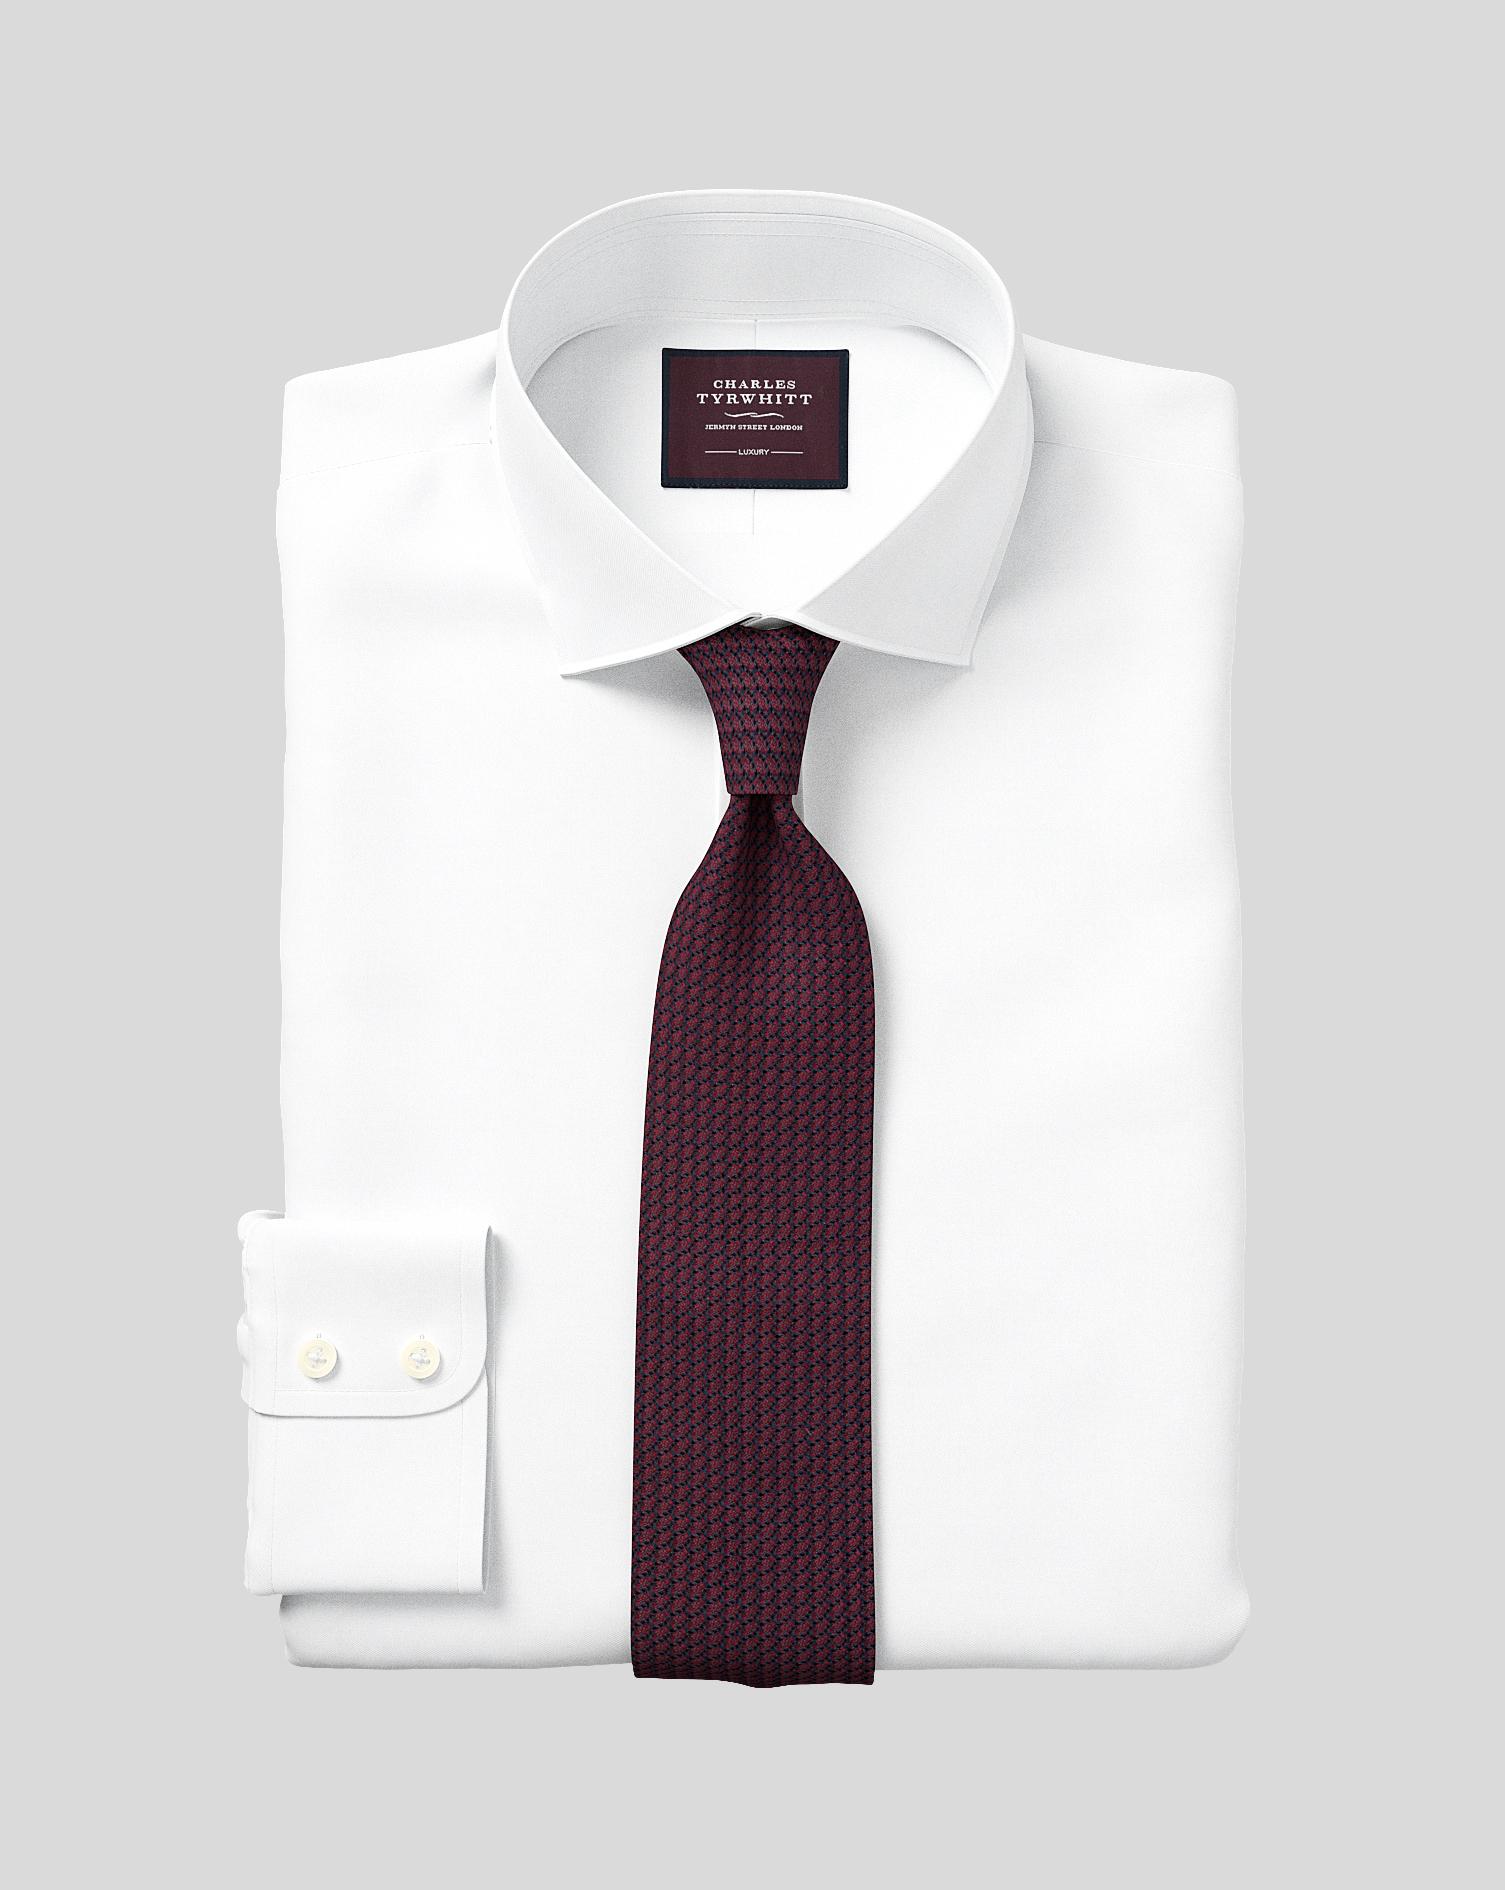 Slim Fit White Luxury Twill Egyptian Cotton Formal Shirt Single Cuff Size 15/34 by Charles Tyrwhitt